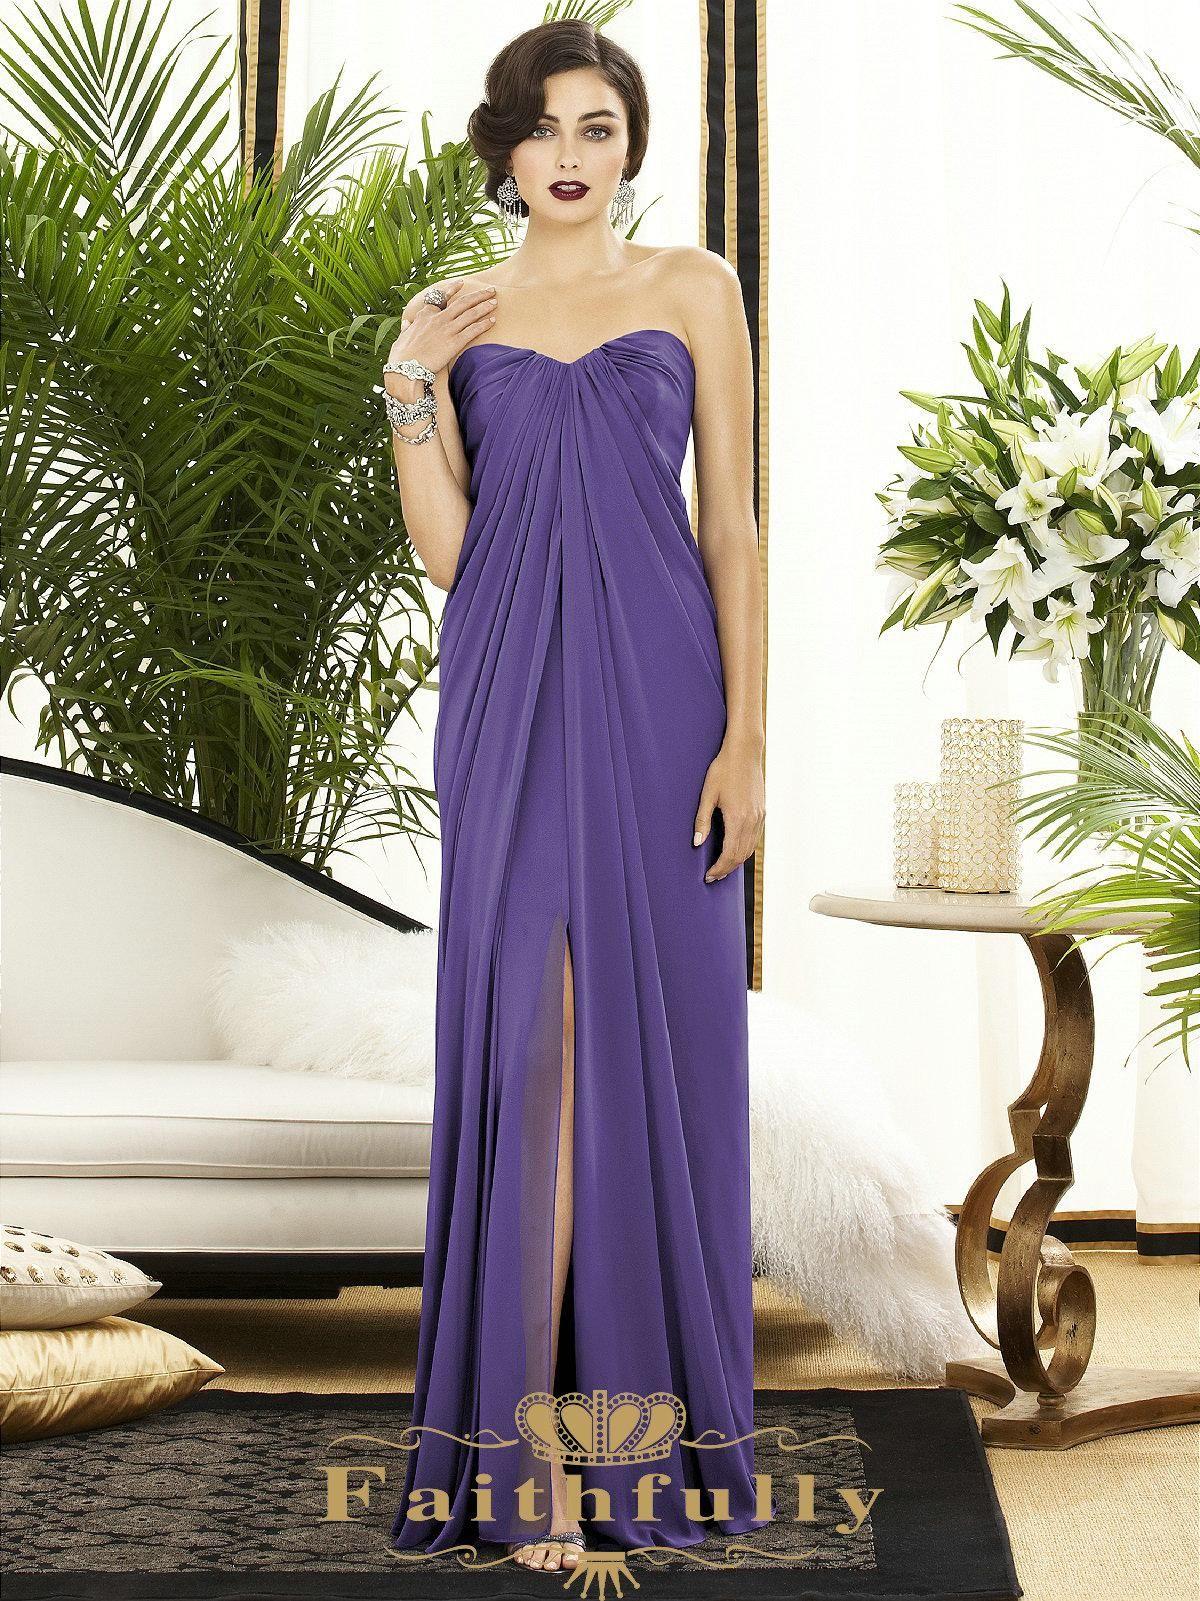 Spaghetti Straps Lace Satin Bridesmaid Dresses Skirt Train Lace ...